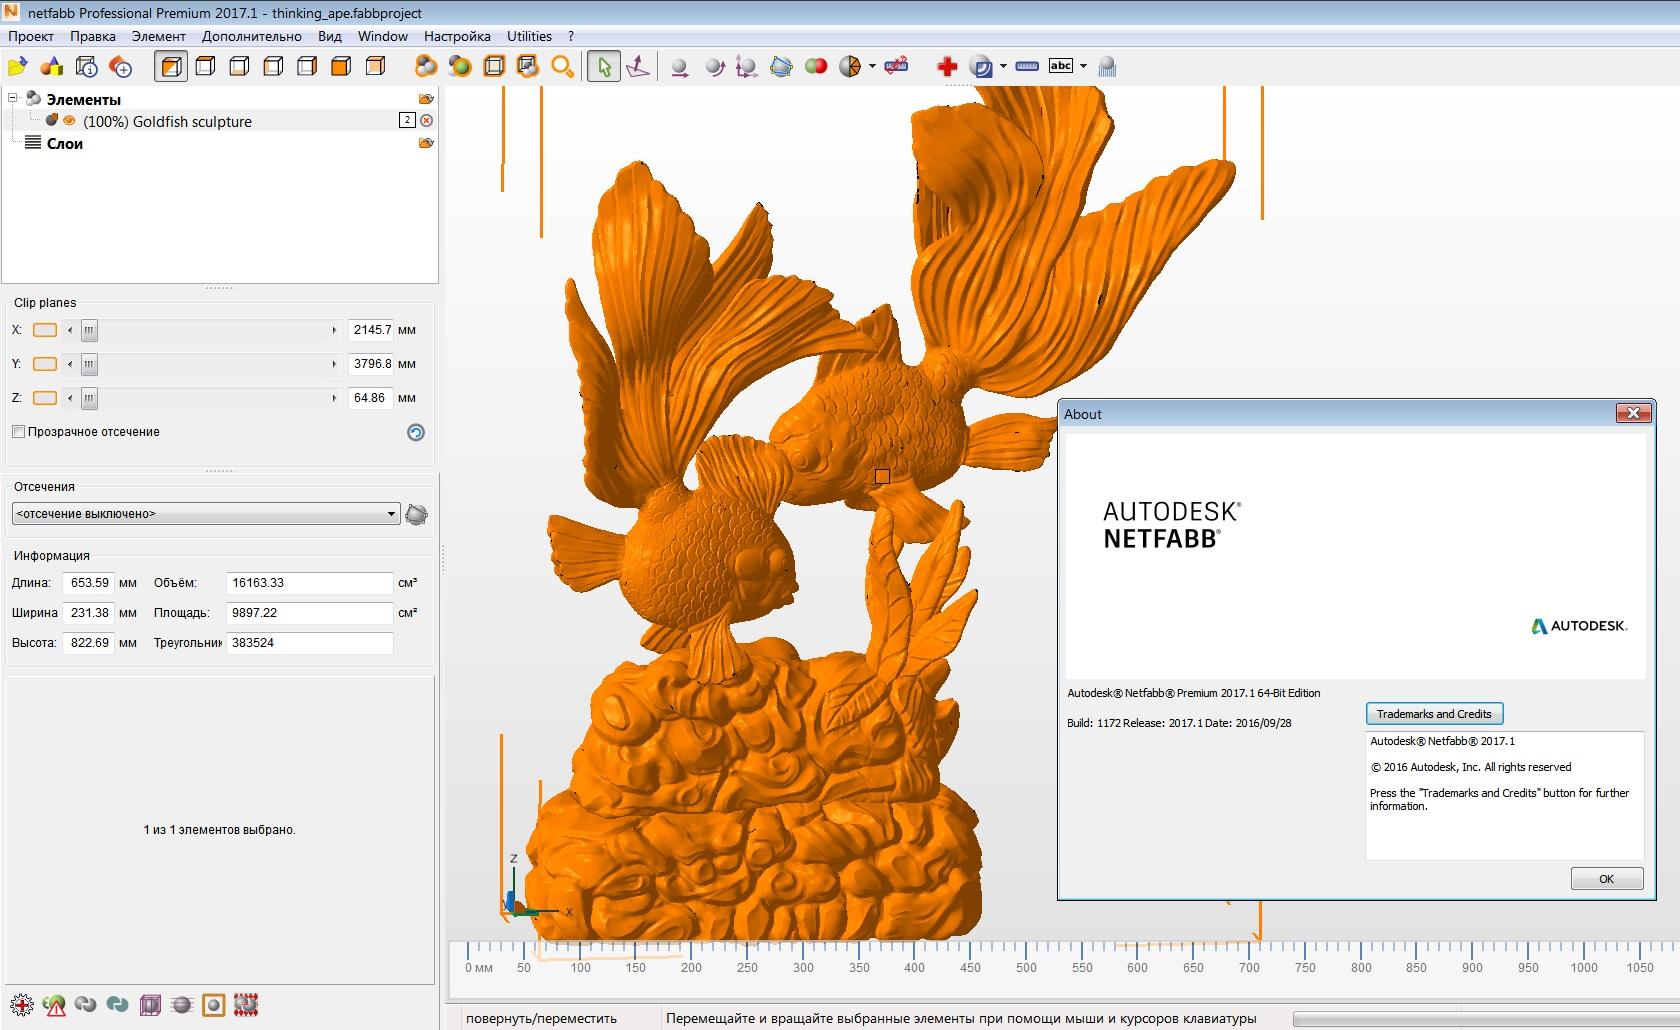 Working with Autodesk Netfabb Premium 2017.1 64bit full crack